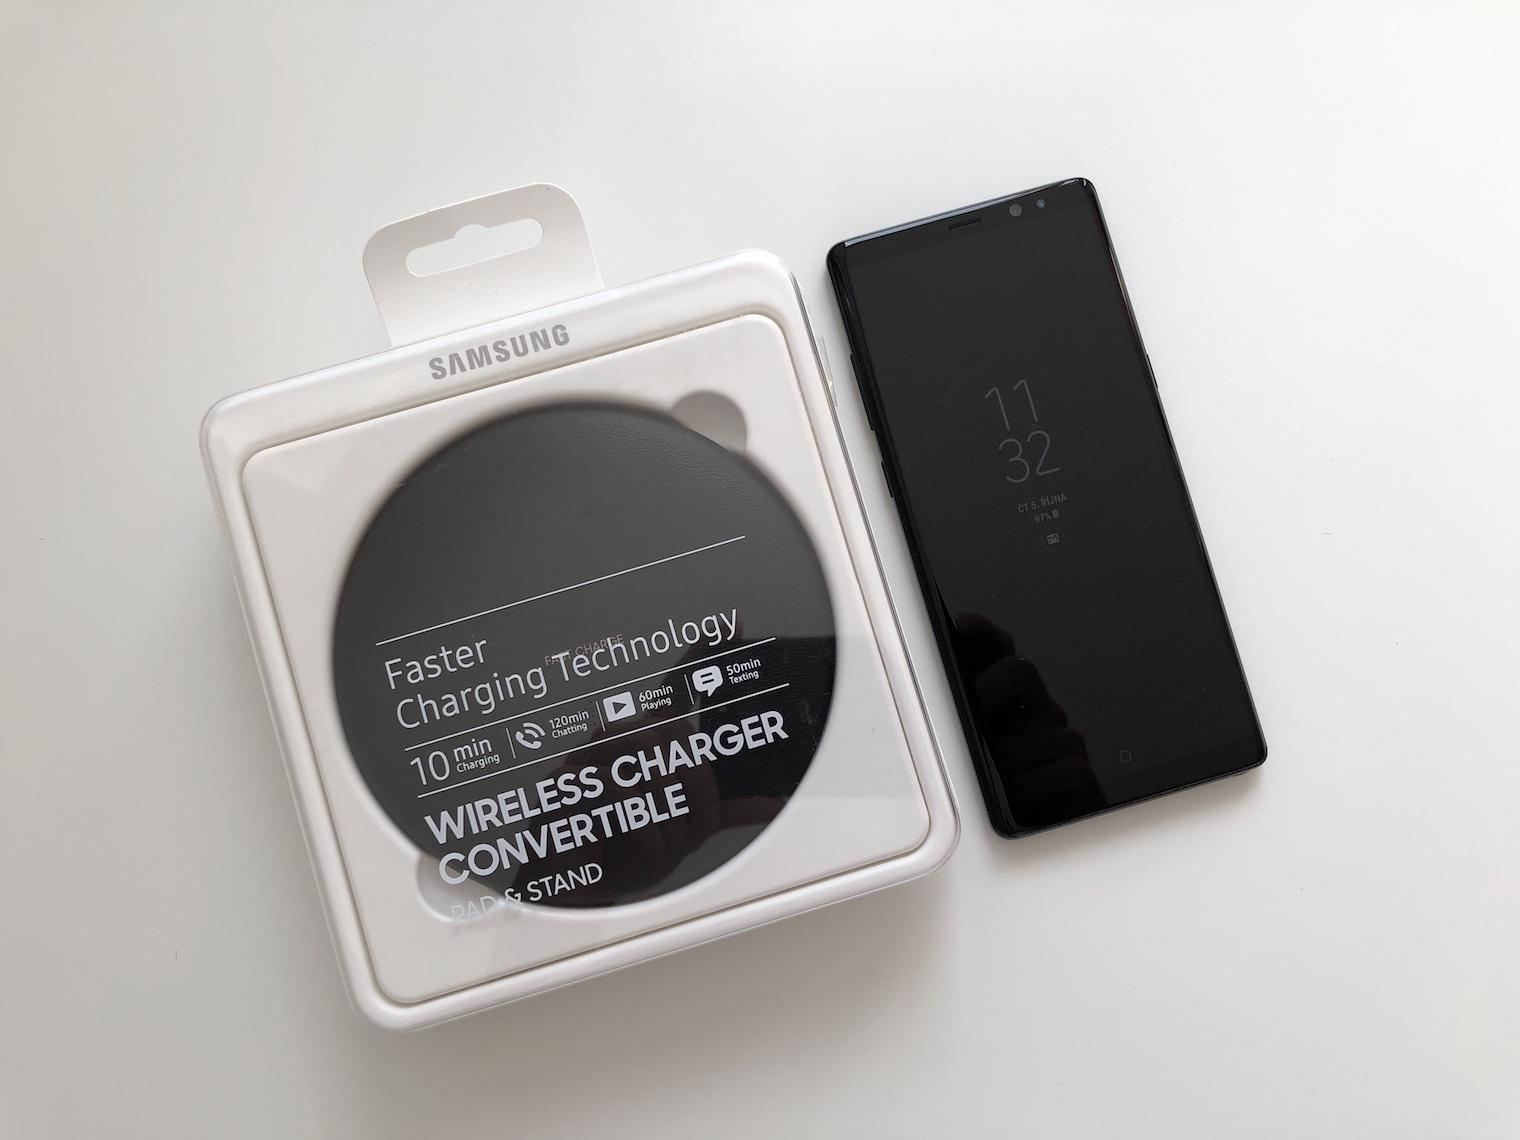 bezdratova podlozka Samsung Wireless Charger 5